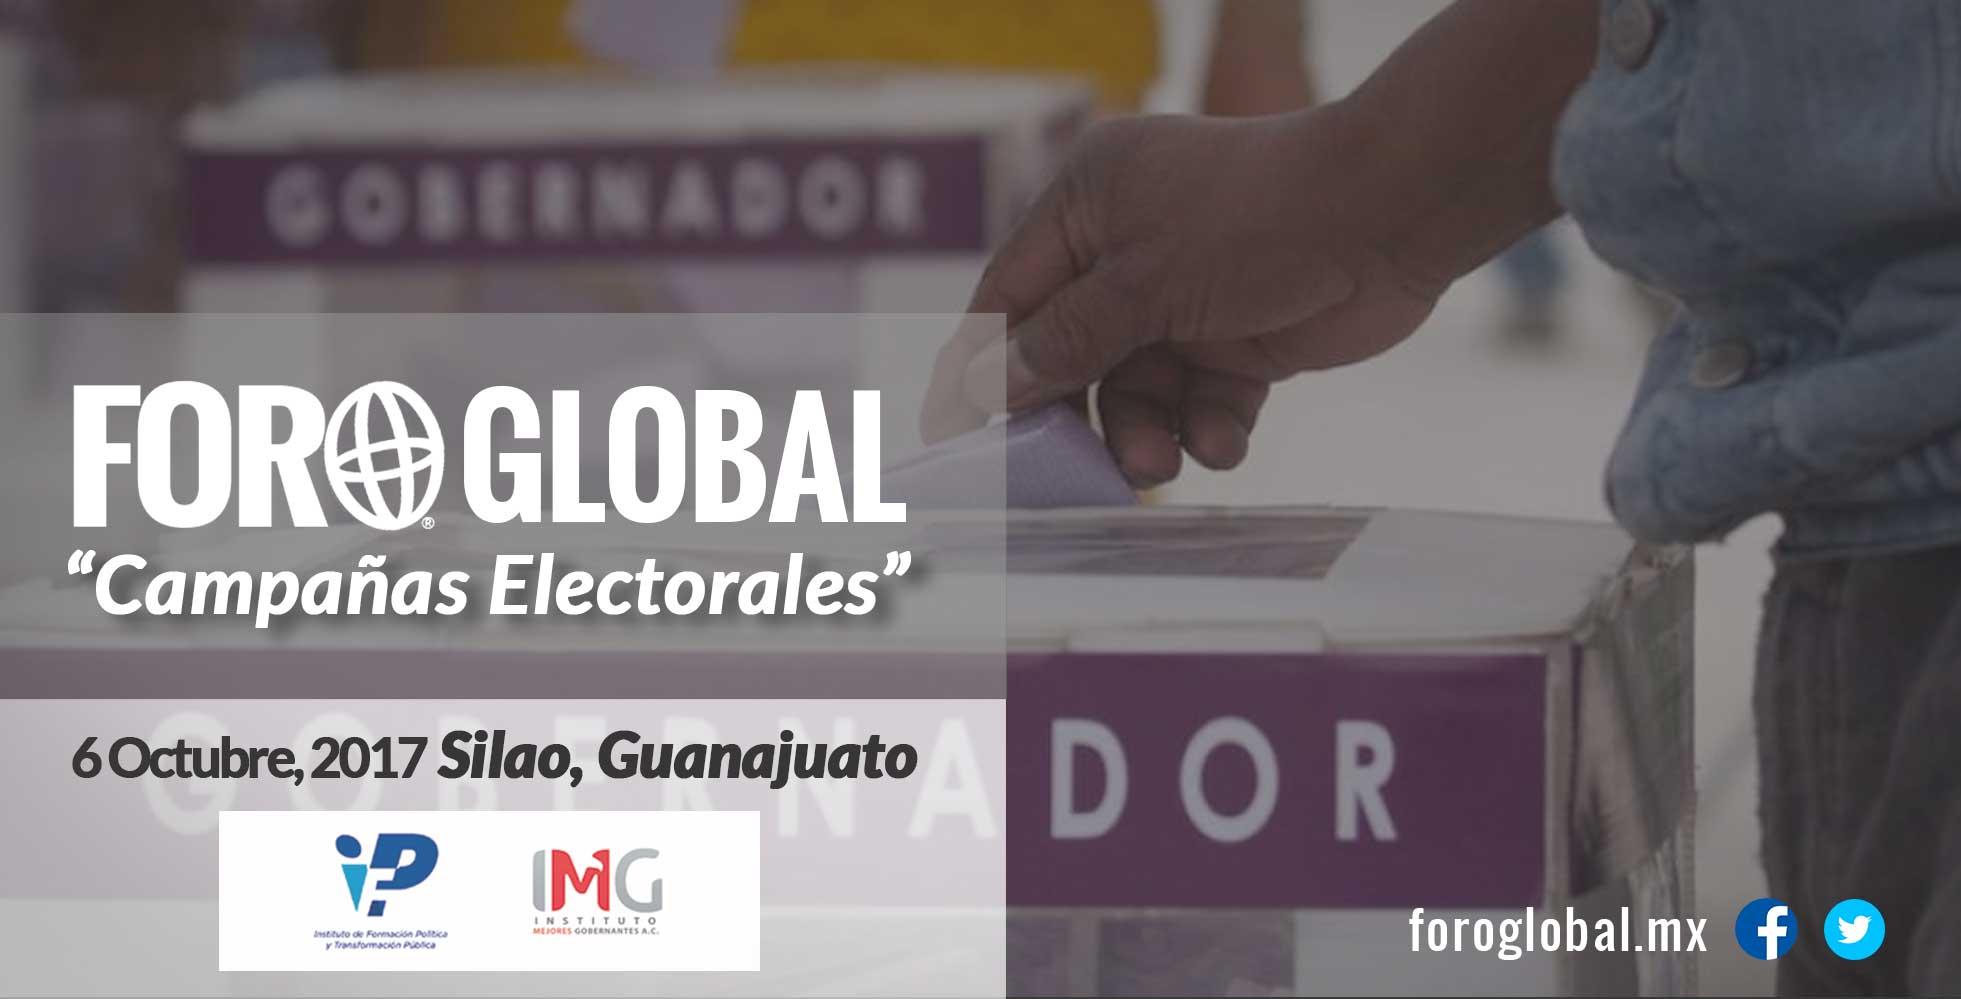 Foro Global Campañas Electorales. foroglobal.mx